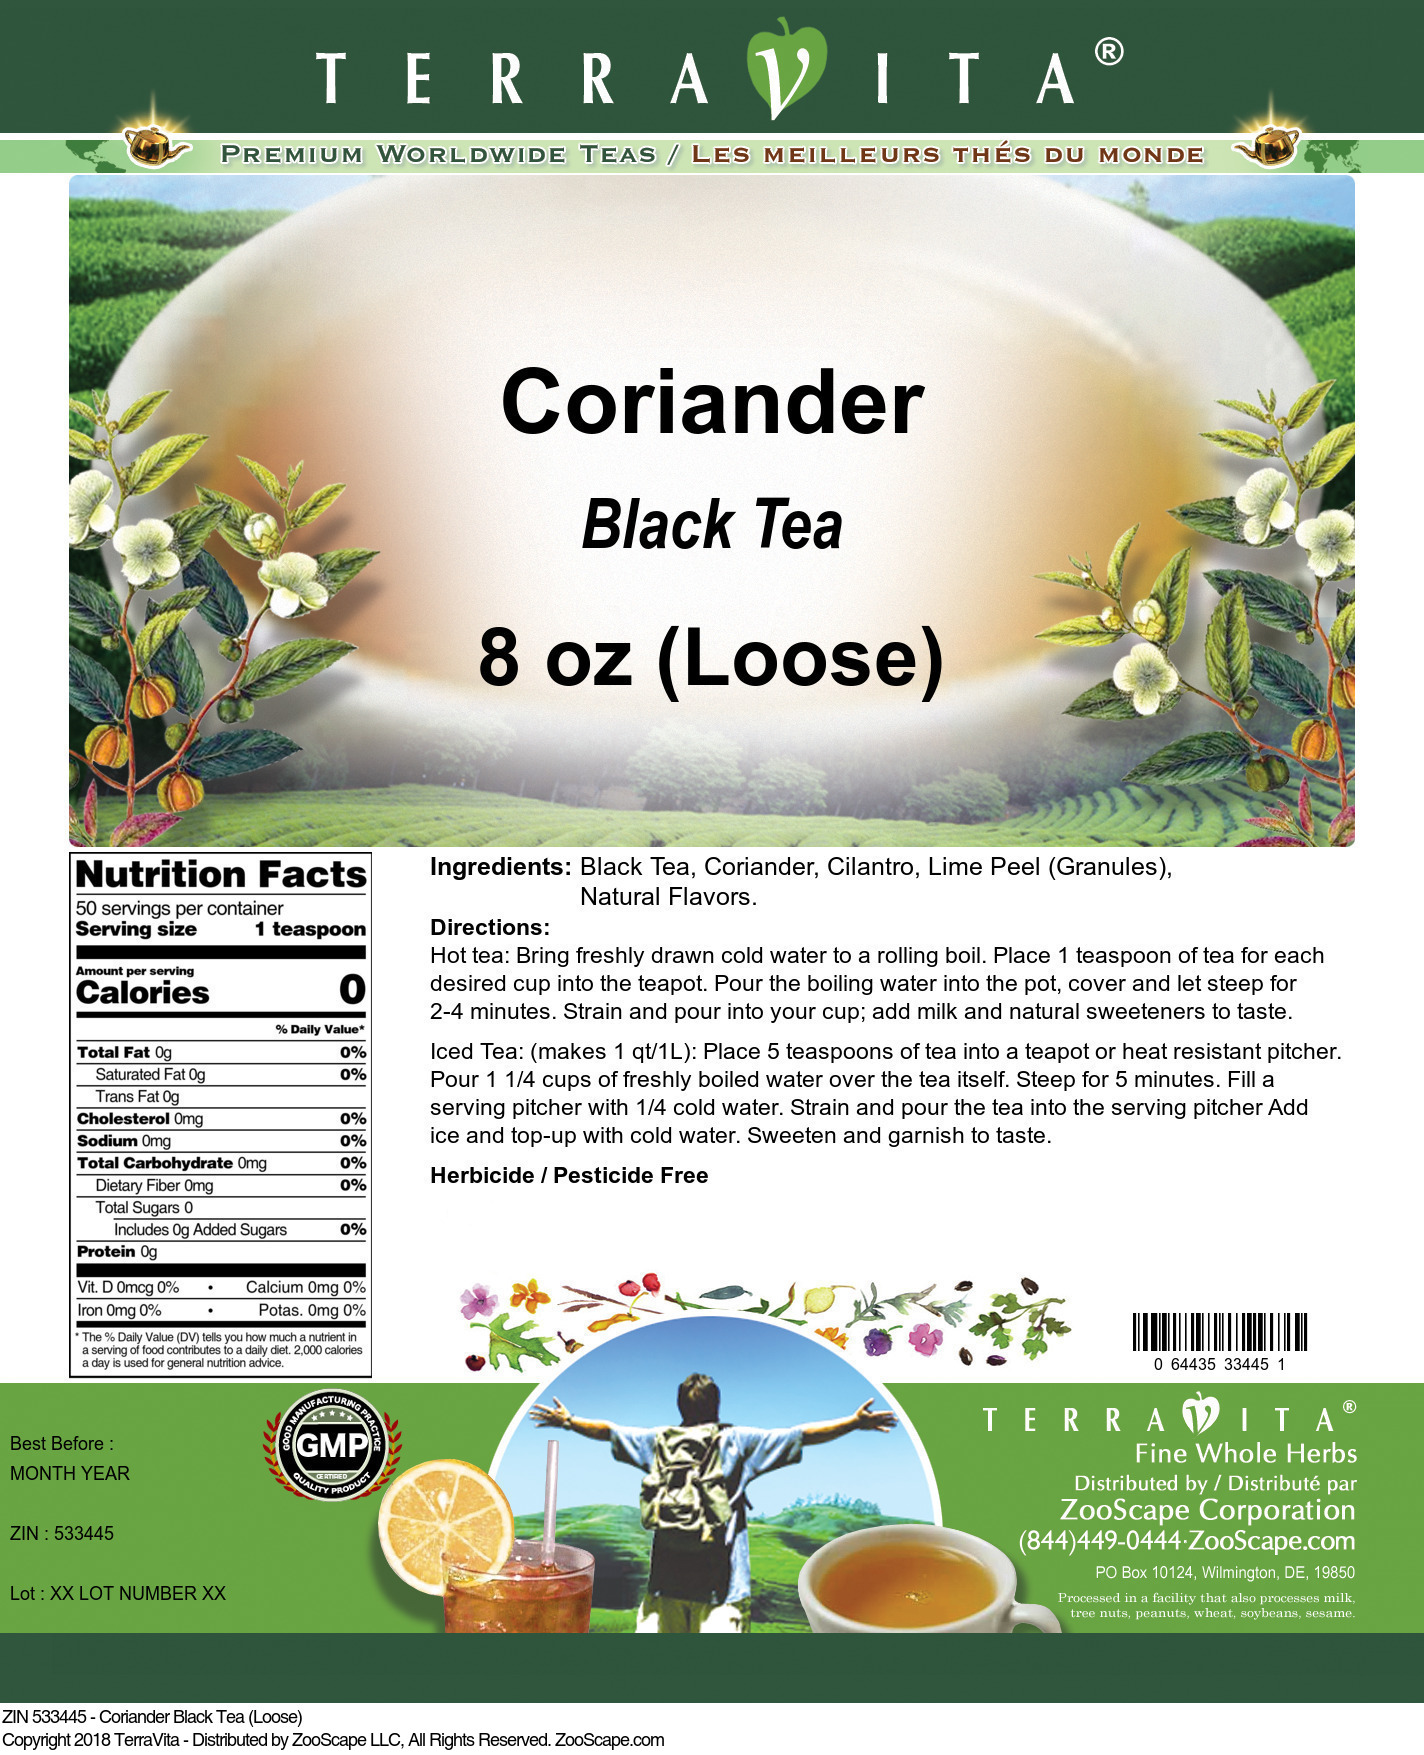 Coriander Black Tea (Loose)